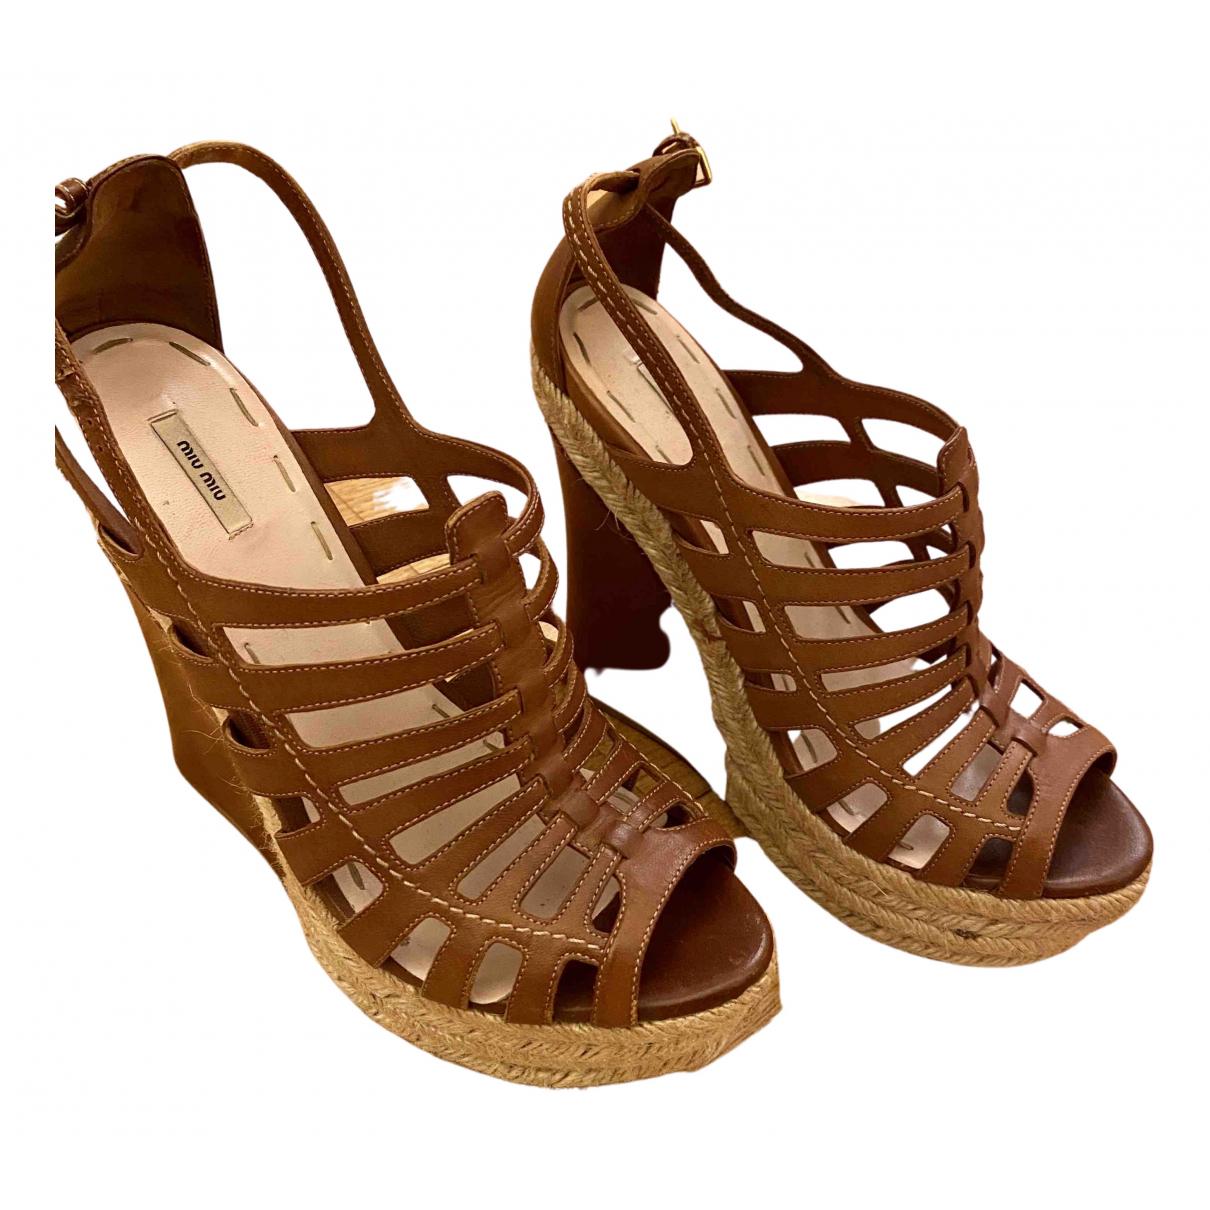 Miu Miu N Brown Leather Heels for Women 39.5 EU